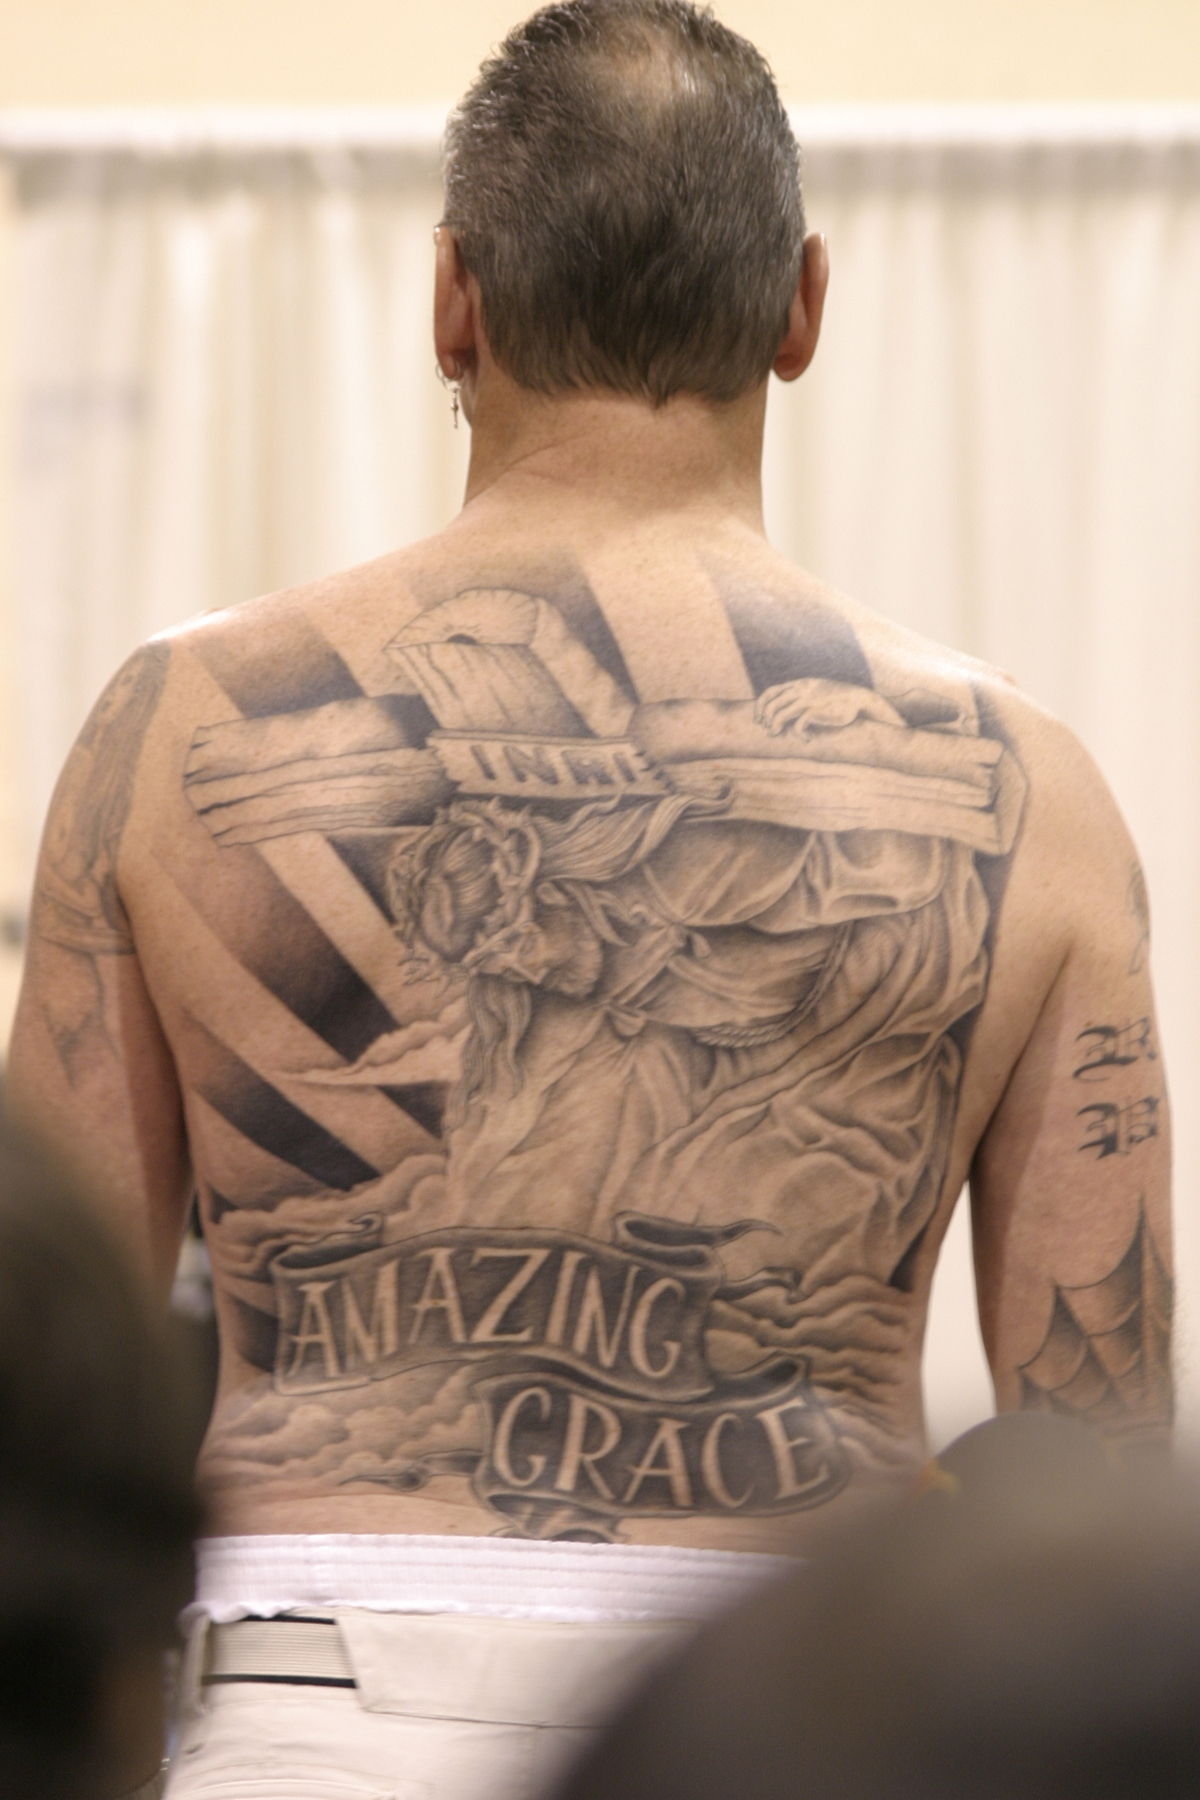 Tattoo_Expo019.JPG